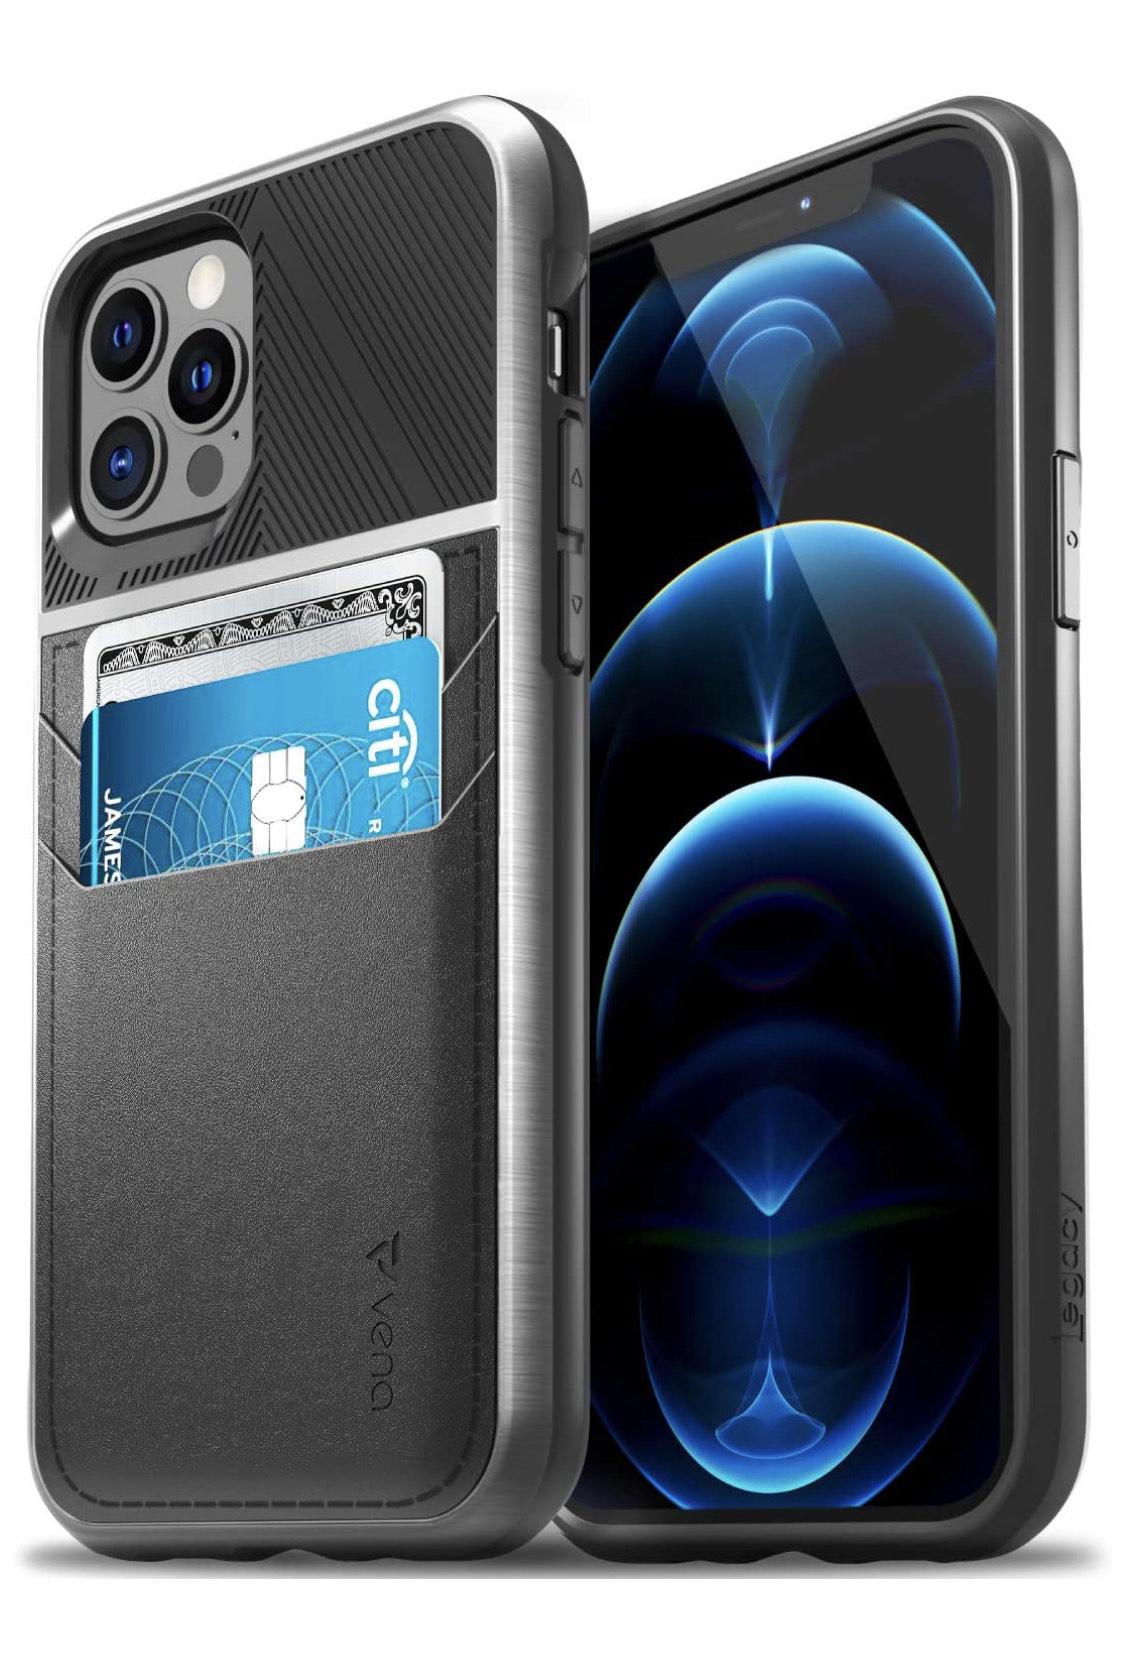 [Amazon Prime ] Vena Legacy Brieftasche Hülle für Apple iPhone 12/12 Pro Leder Etui Schutzhülle - Schwarz